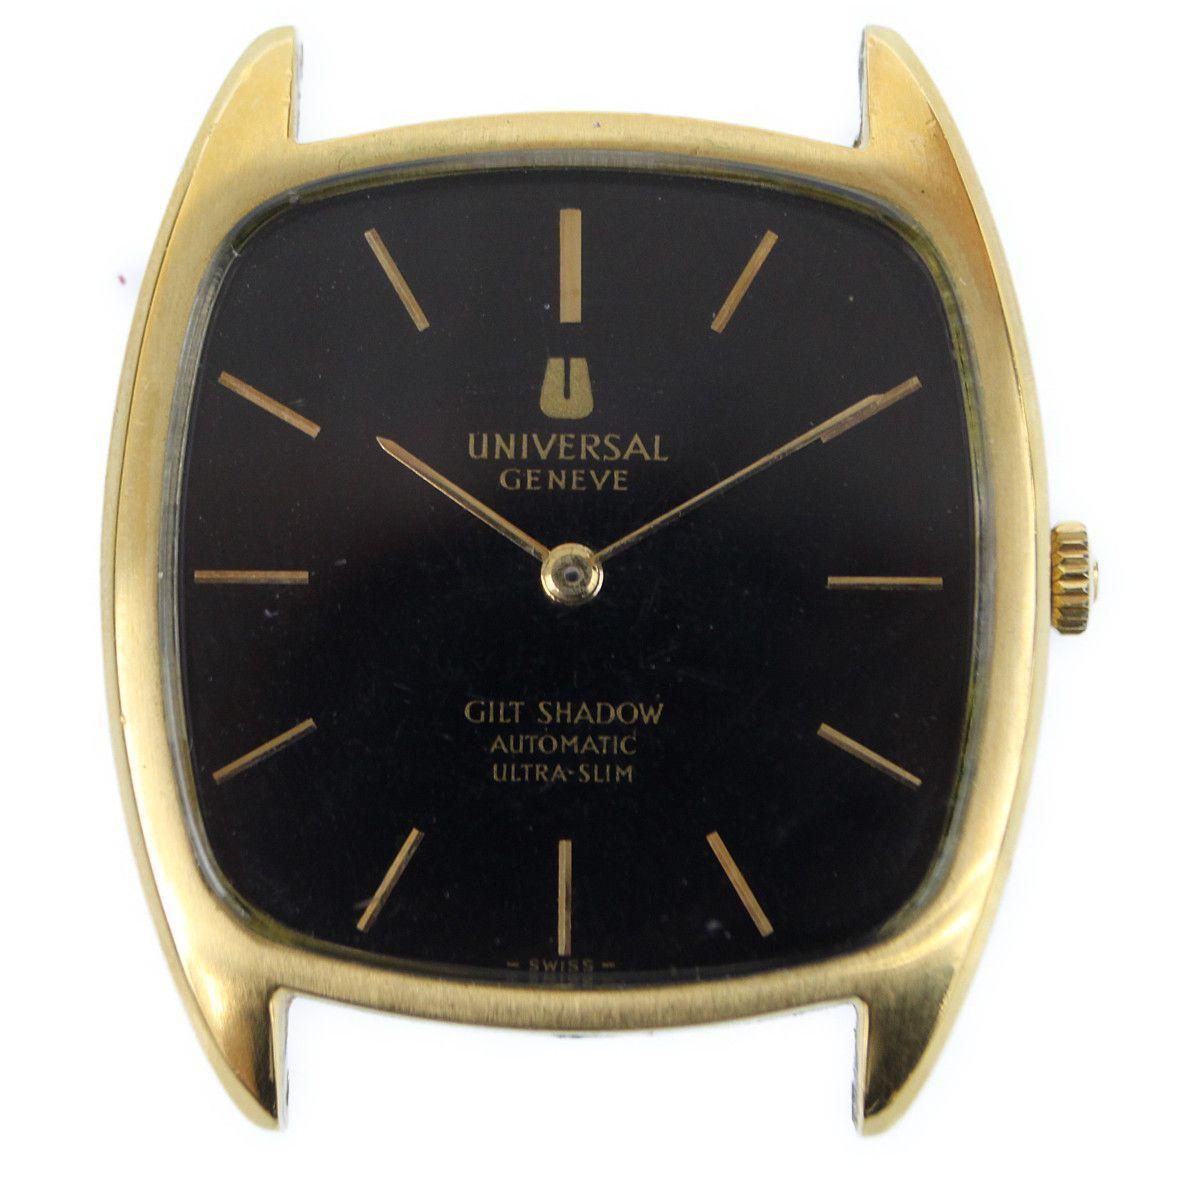 3a61e543939b 1円~ Universal Geneve ユニバーサルジュネーブ ギルトシャドウ ウルトラスリム 本体のみ 腕時計 自動巻き